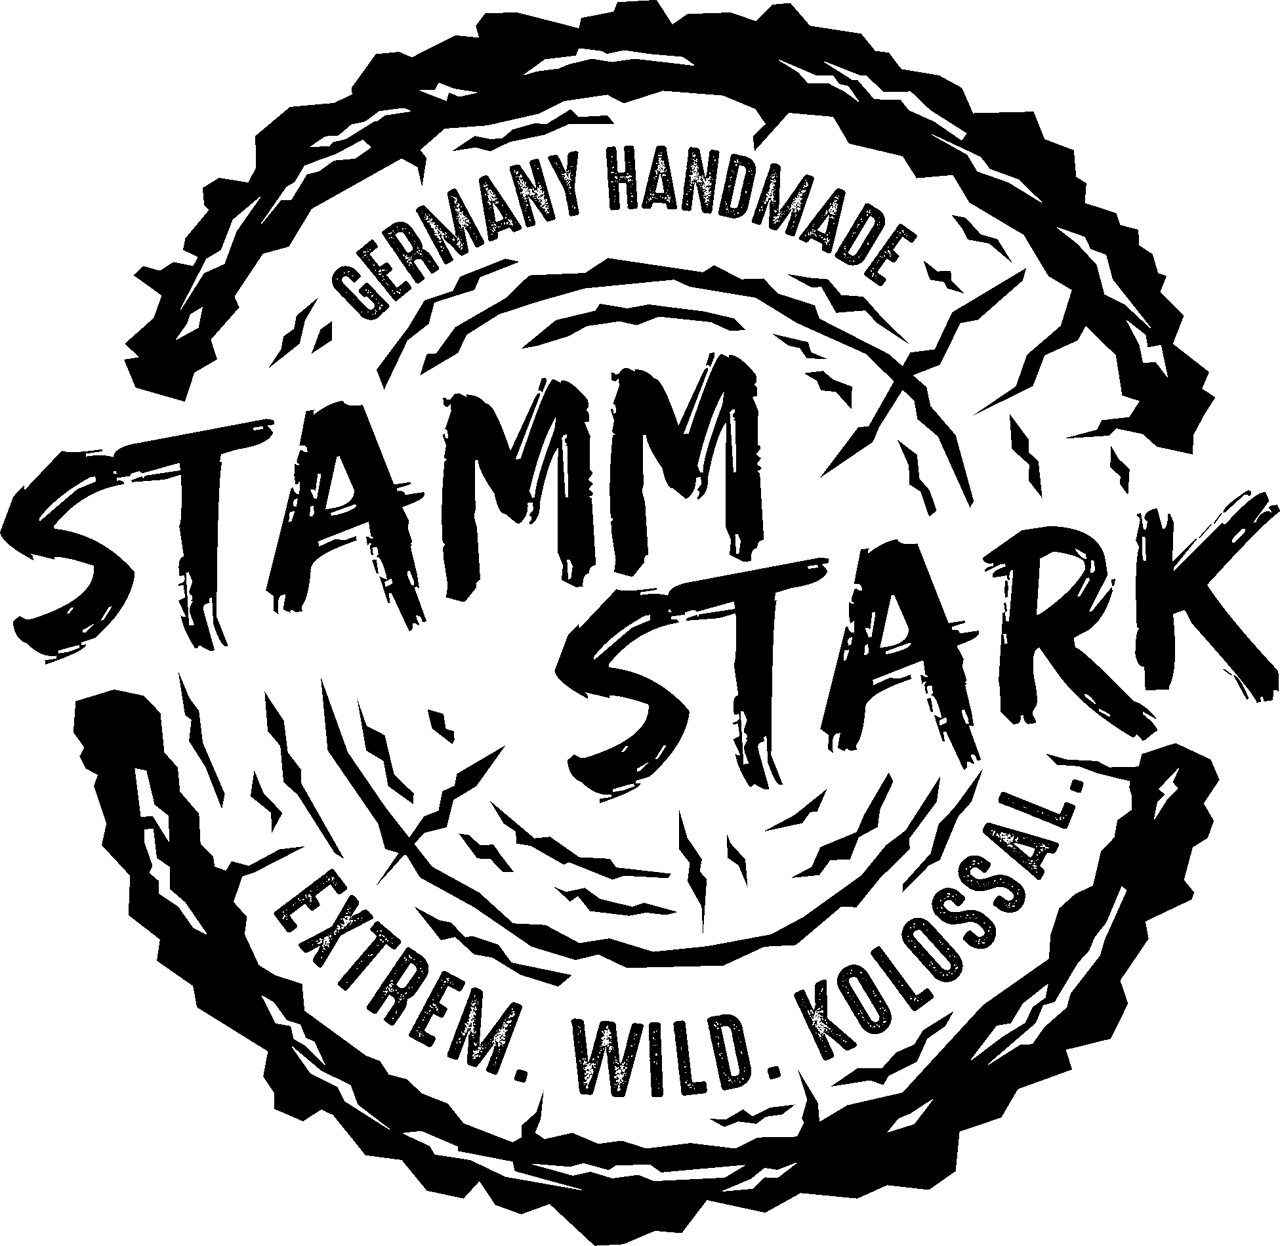 Stammstark Germany Handmade